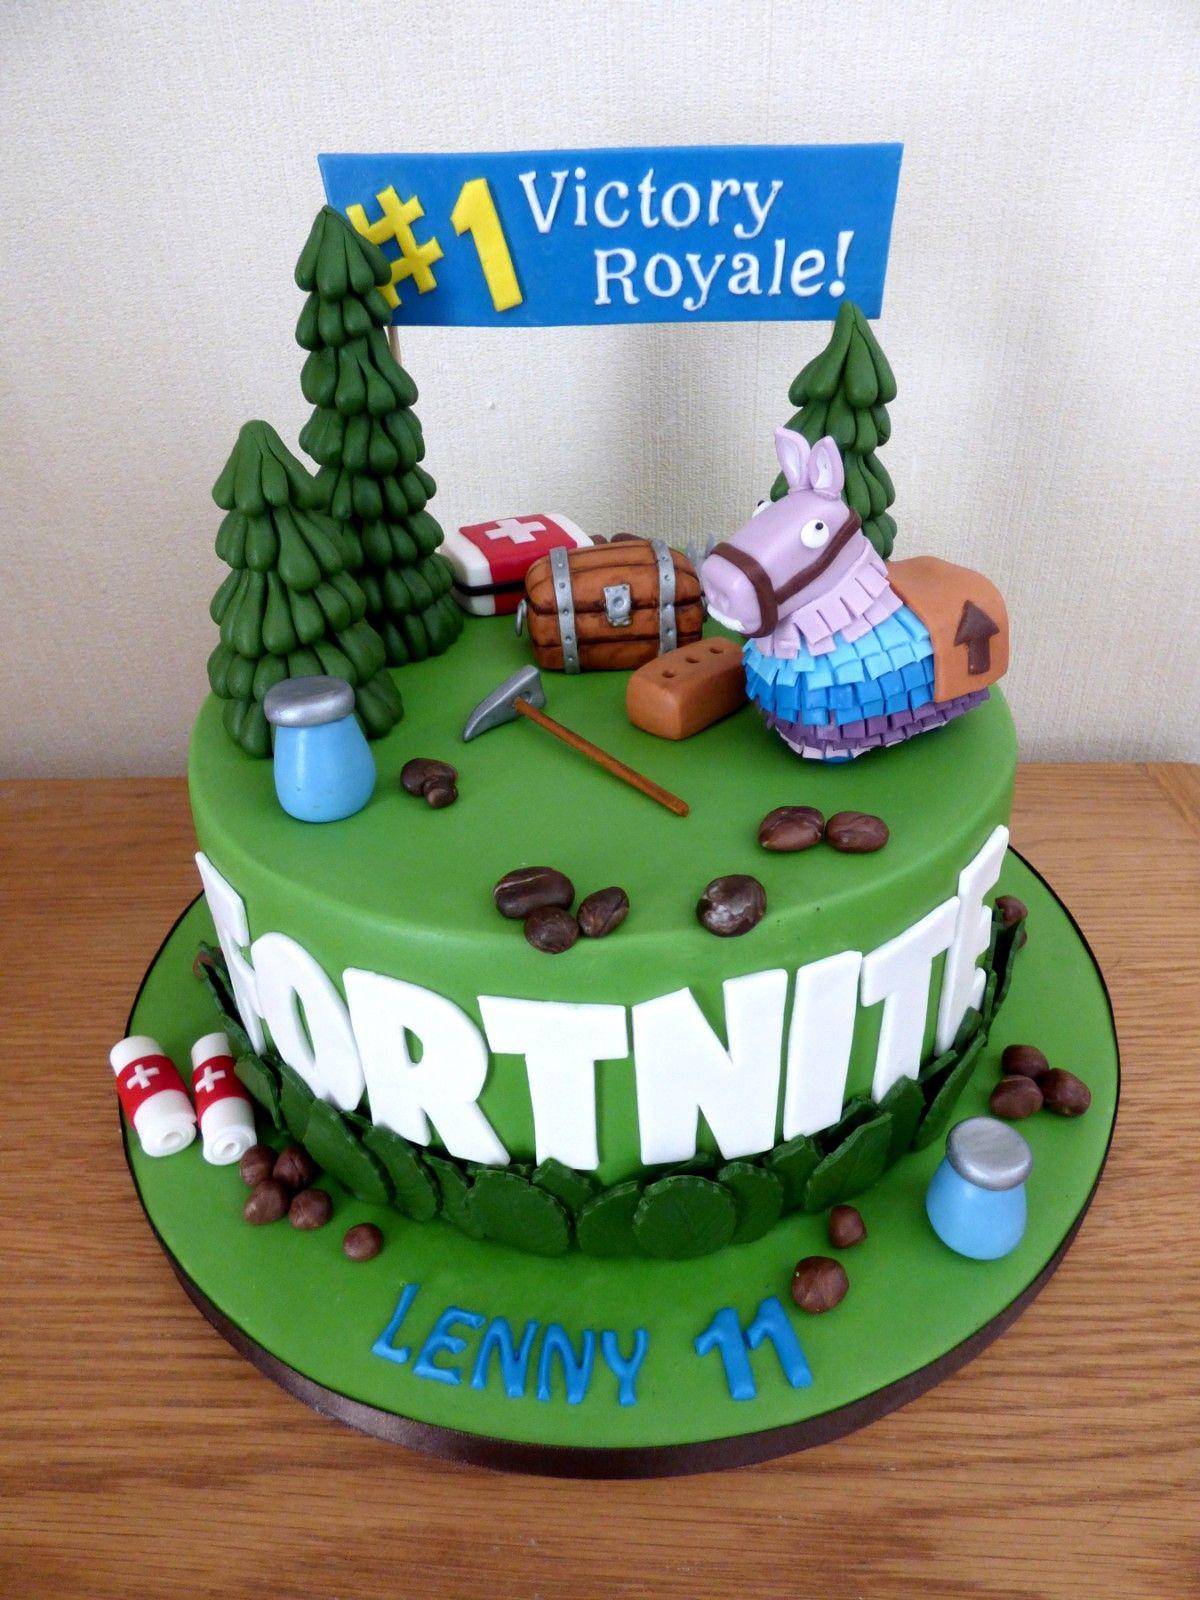 Fortnite Themed Birthday Cake « Susie's Themed